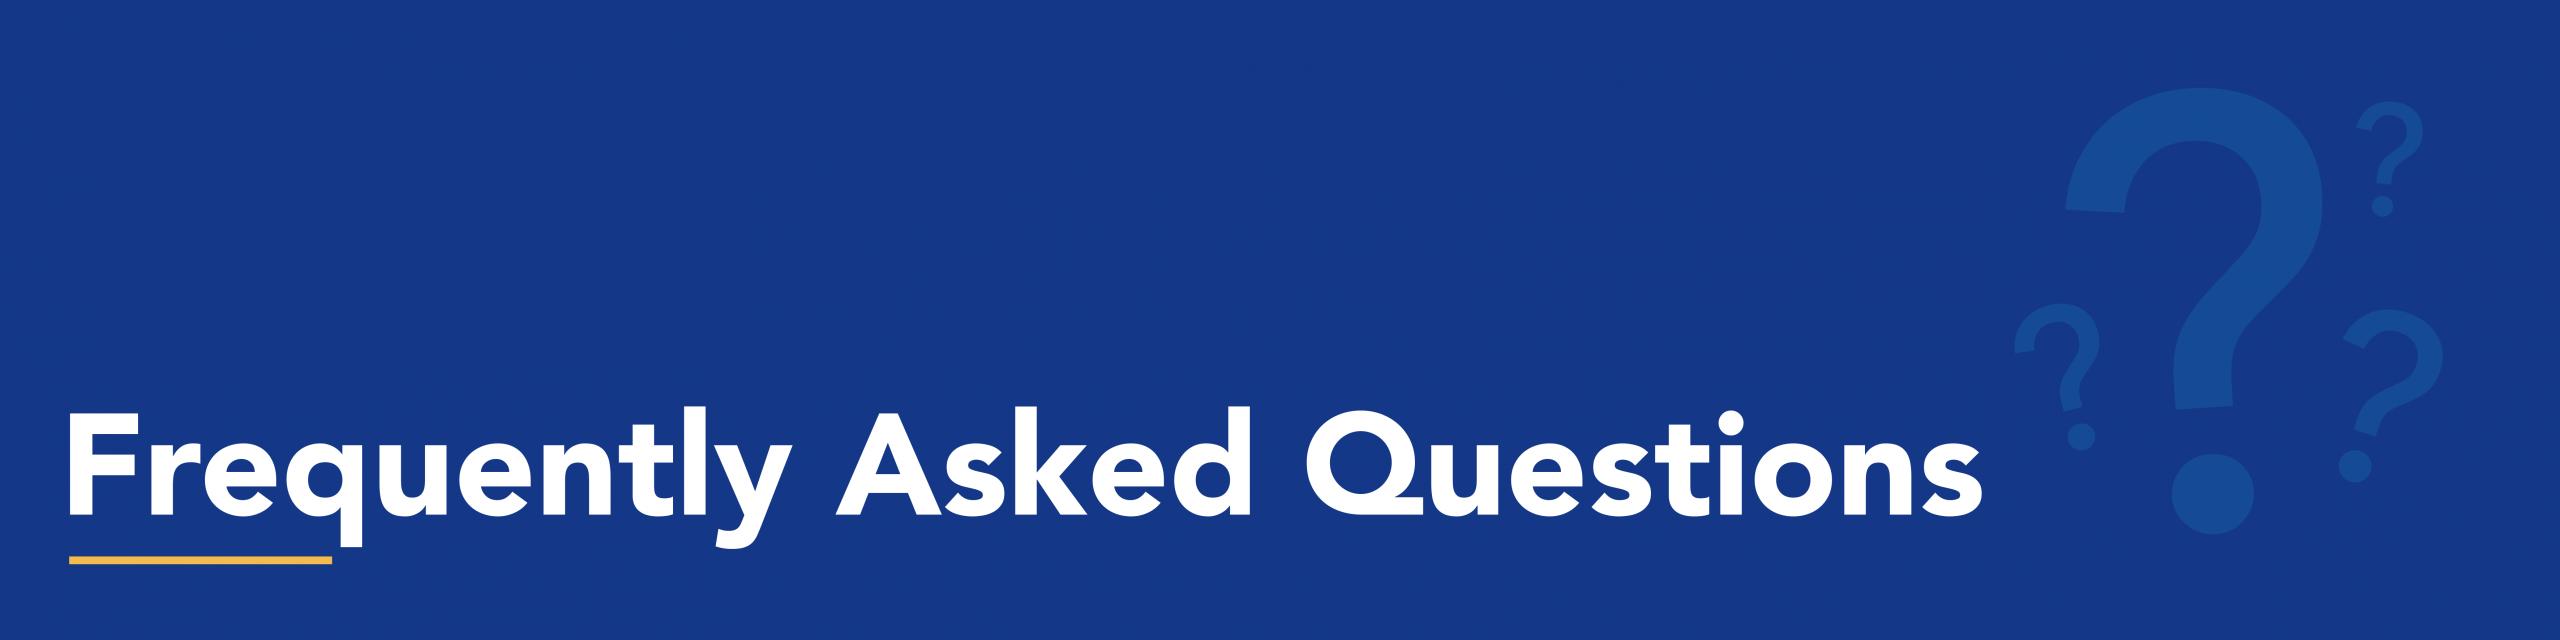 FAQs backendcommunications